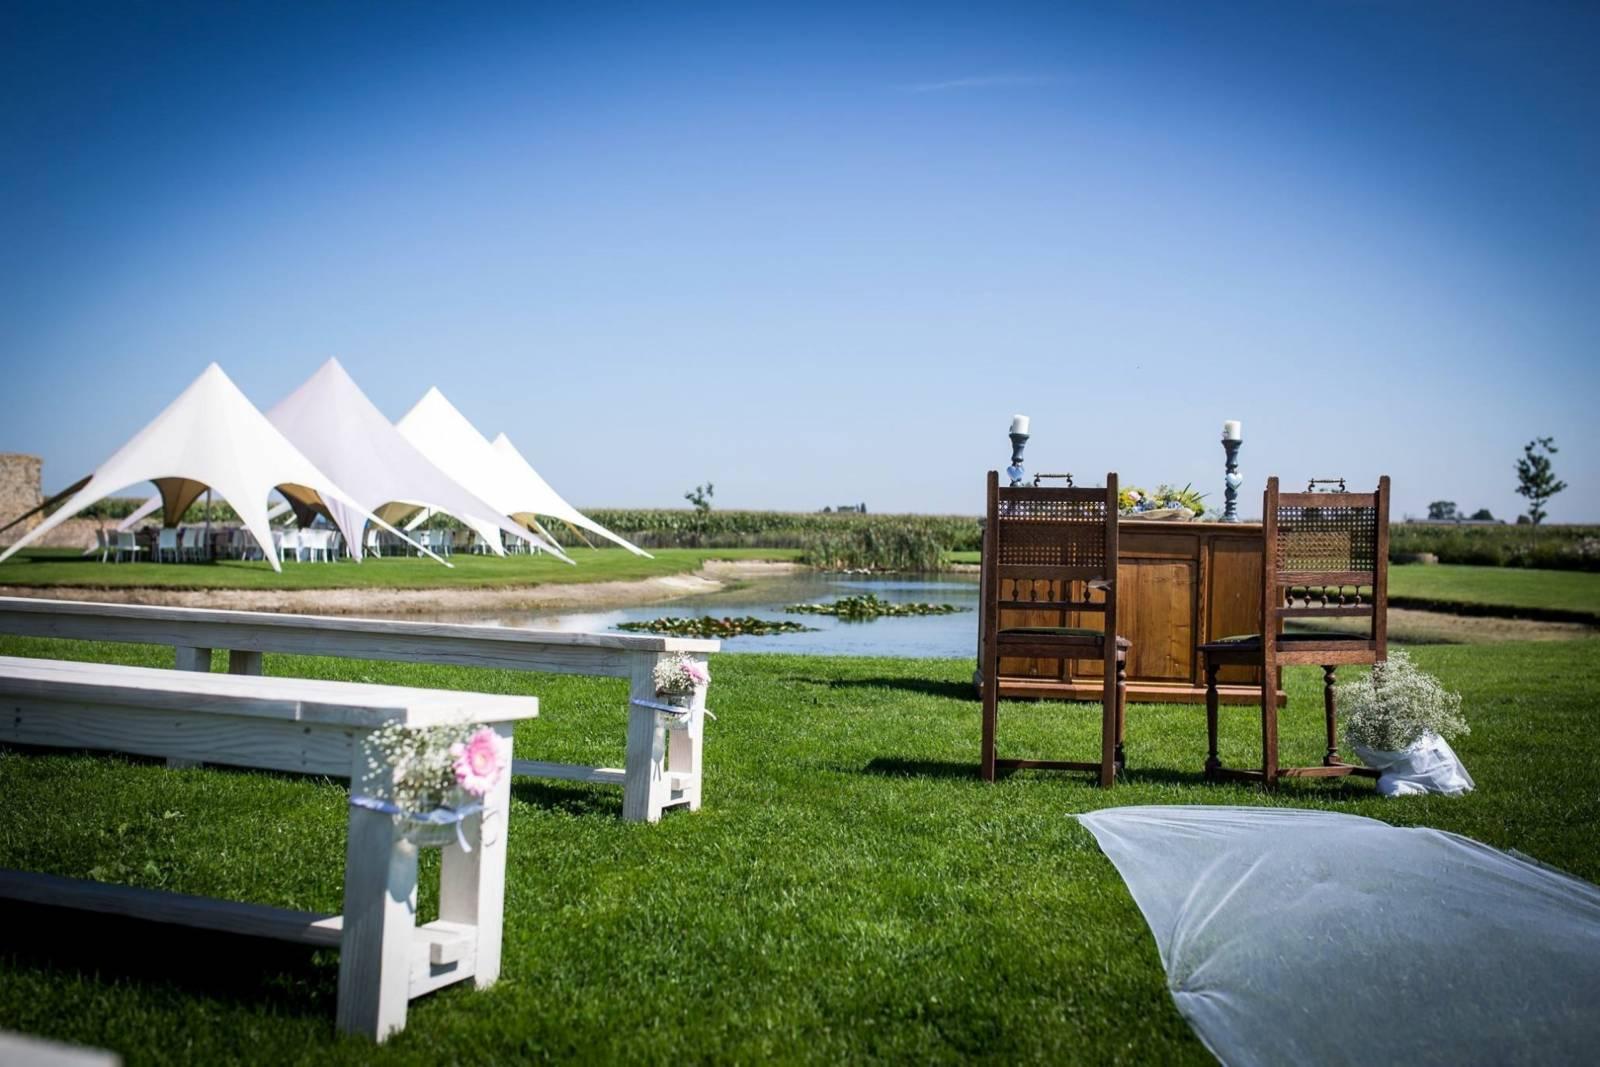 House of Weddings Domein t Eikennest Feestzaal West-Vlaanderen Diksmuide Beerst Tuin Park Vijver Tent Ceremonie Schuur pold (12)